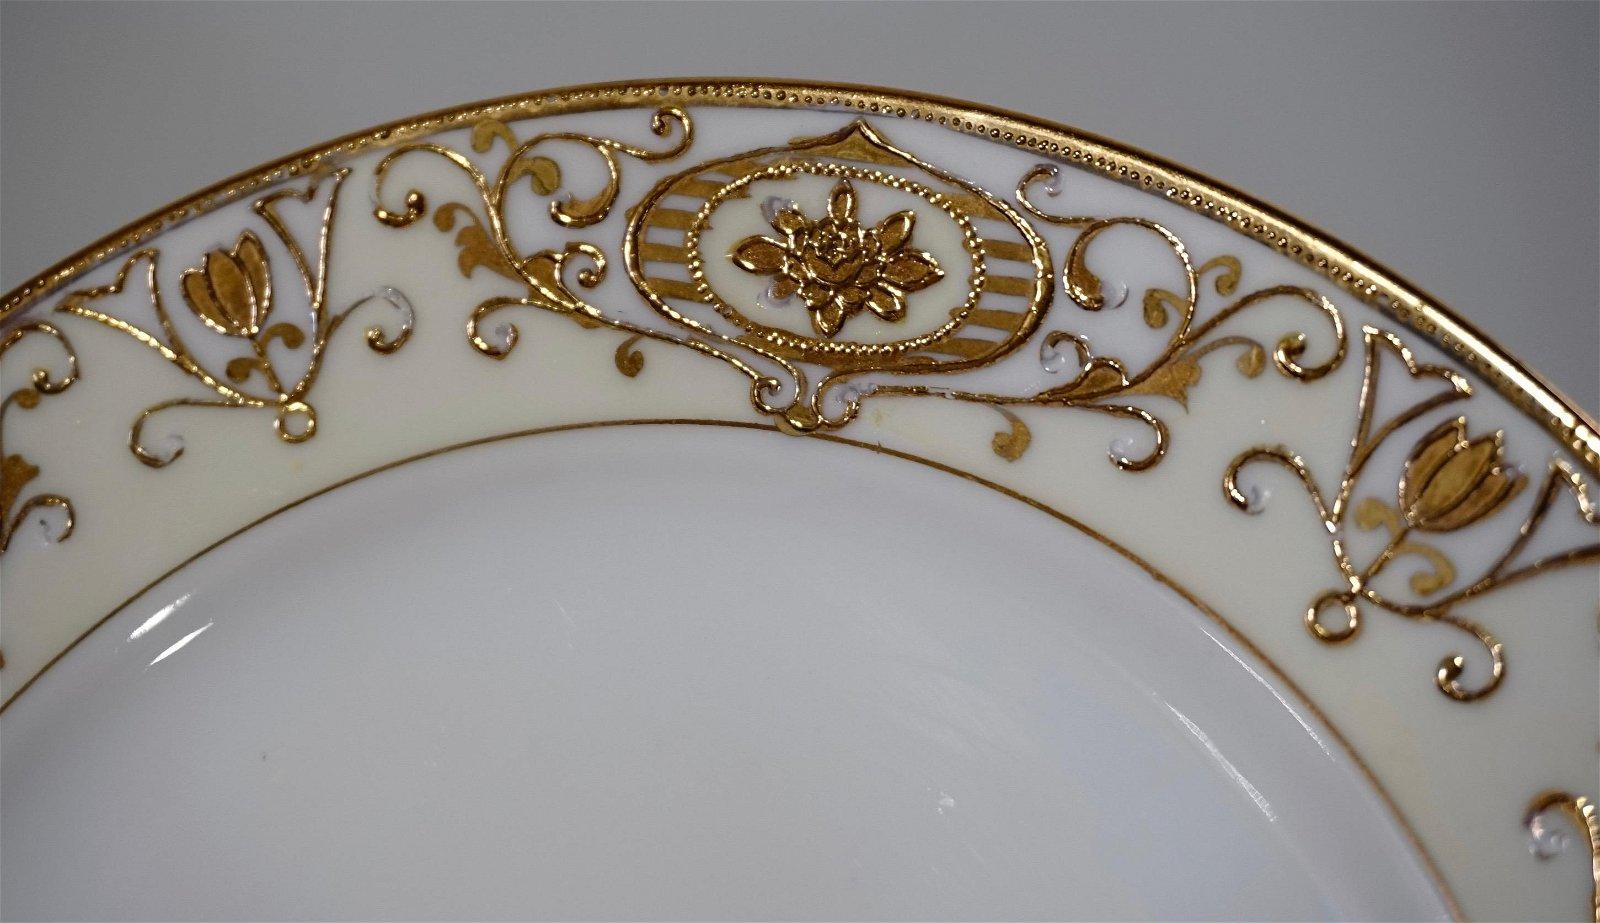 Noritake Gold Moriage Vintage Porcelain Plate